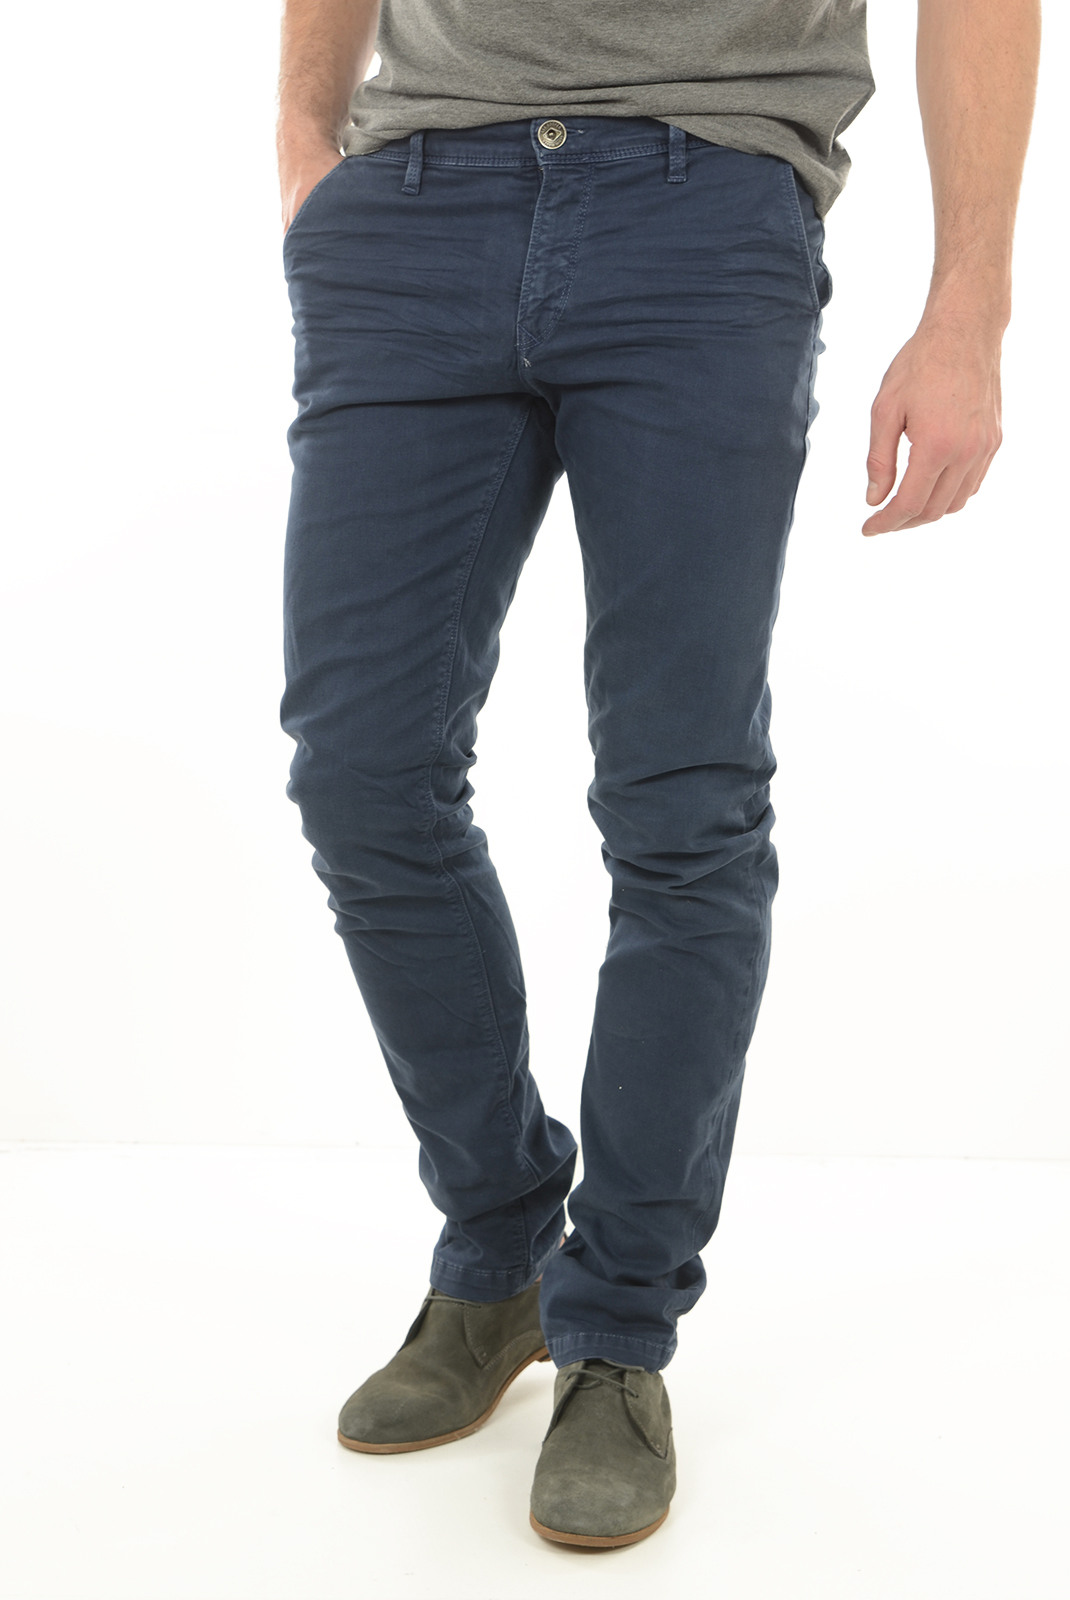 Pantalons chino/citadin  Lee cooper GARVEN 7634 NAVY